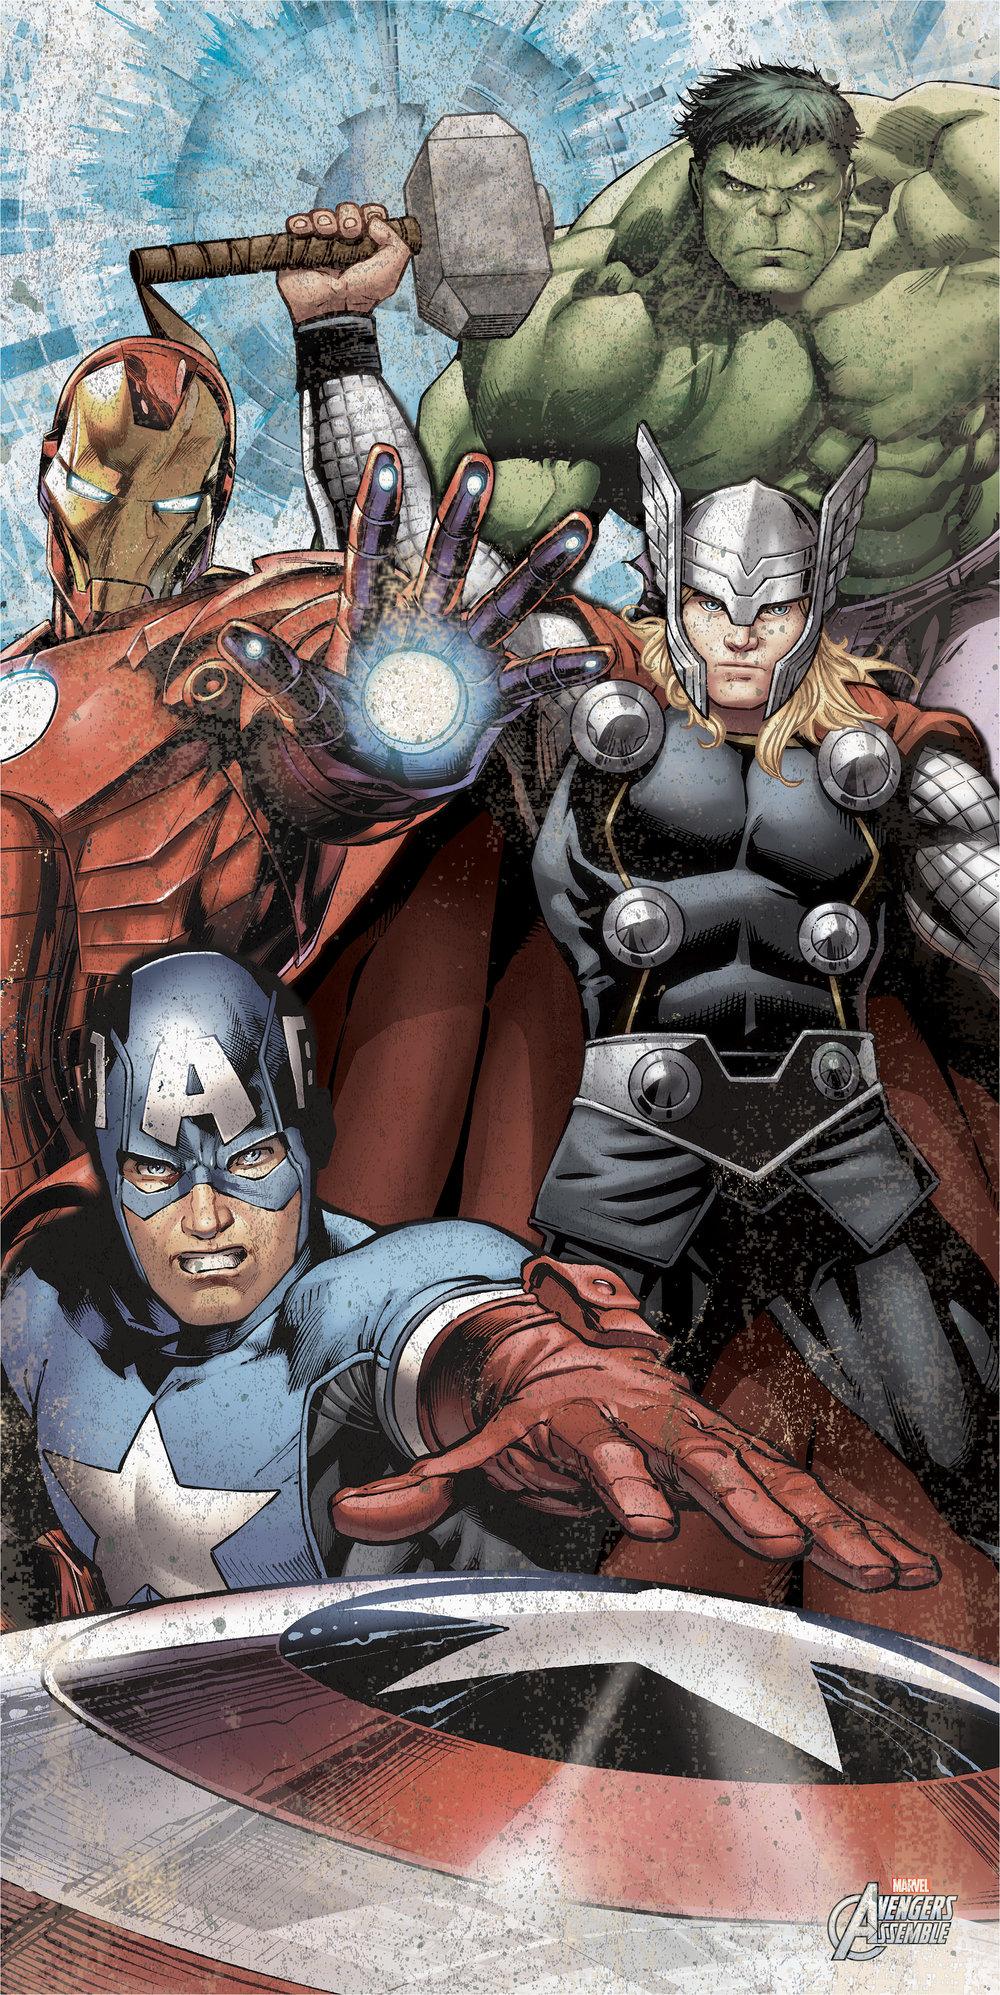 AvengersBlast_14x28_vintage.jpg